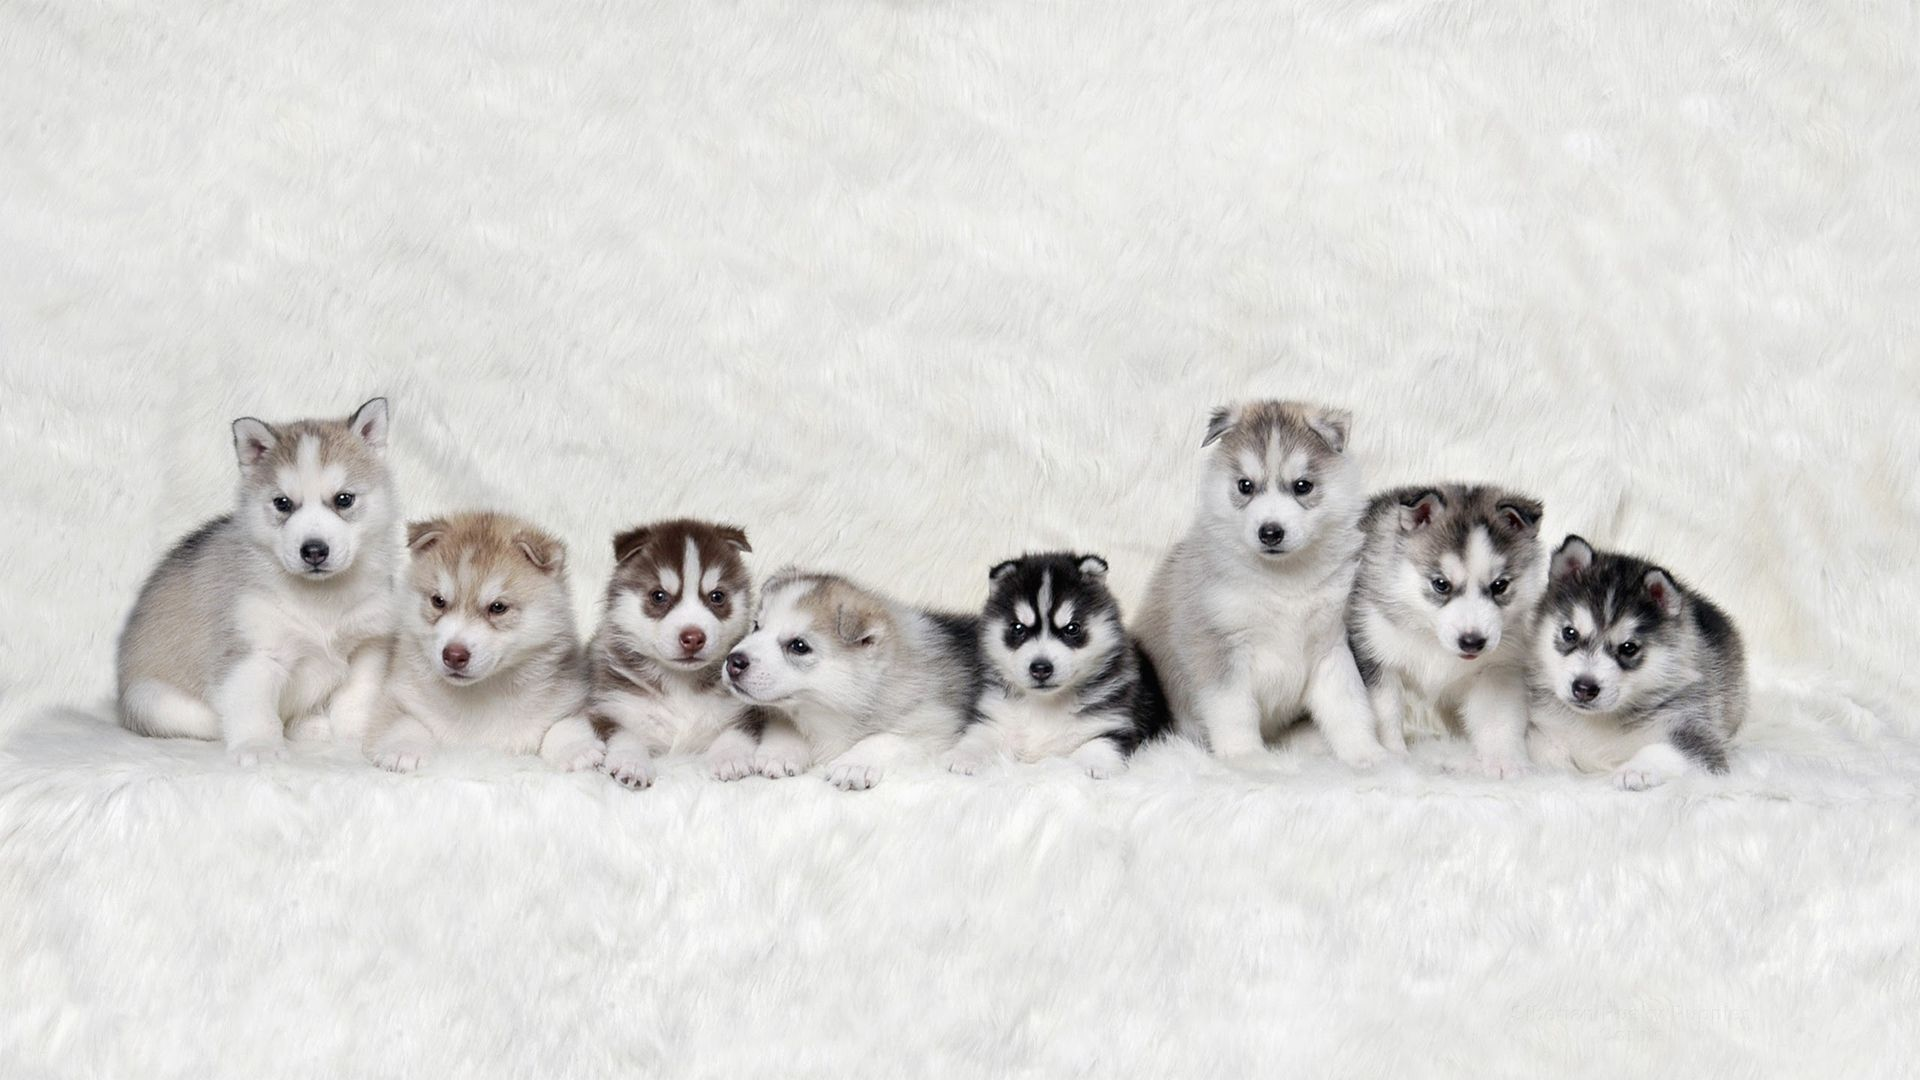 Litter Of Siberian Huskies Adorable 1920 1080 For Your Desktop Puppy Wallpaper Winter Puppy Cute Dogs Breeds